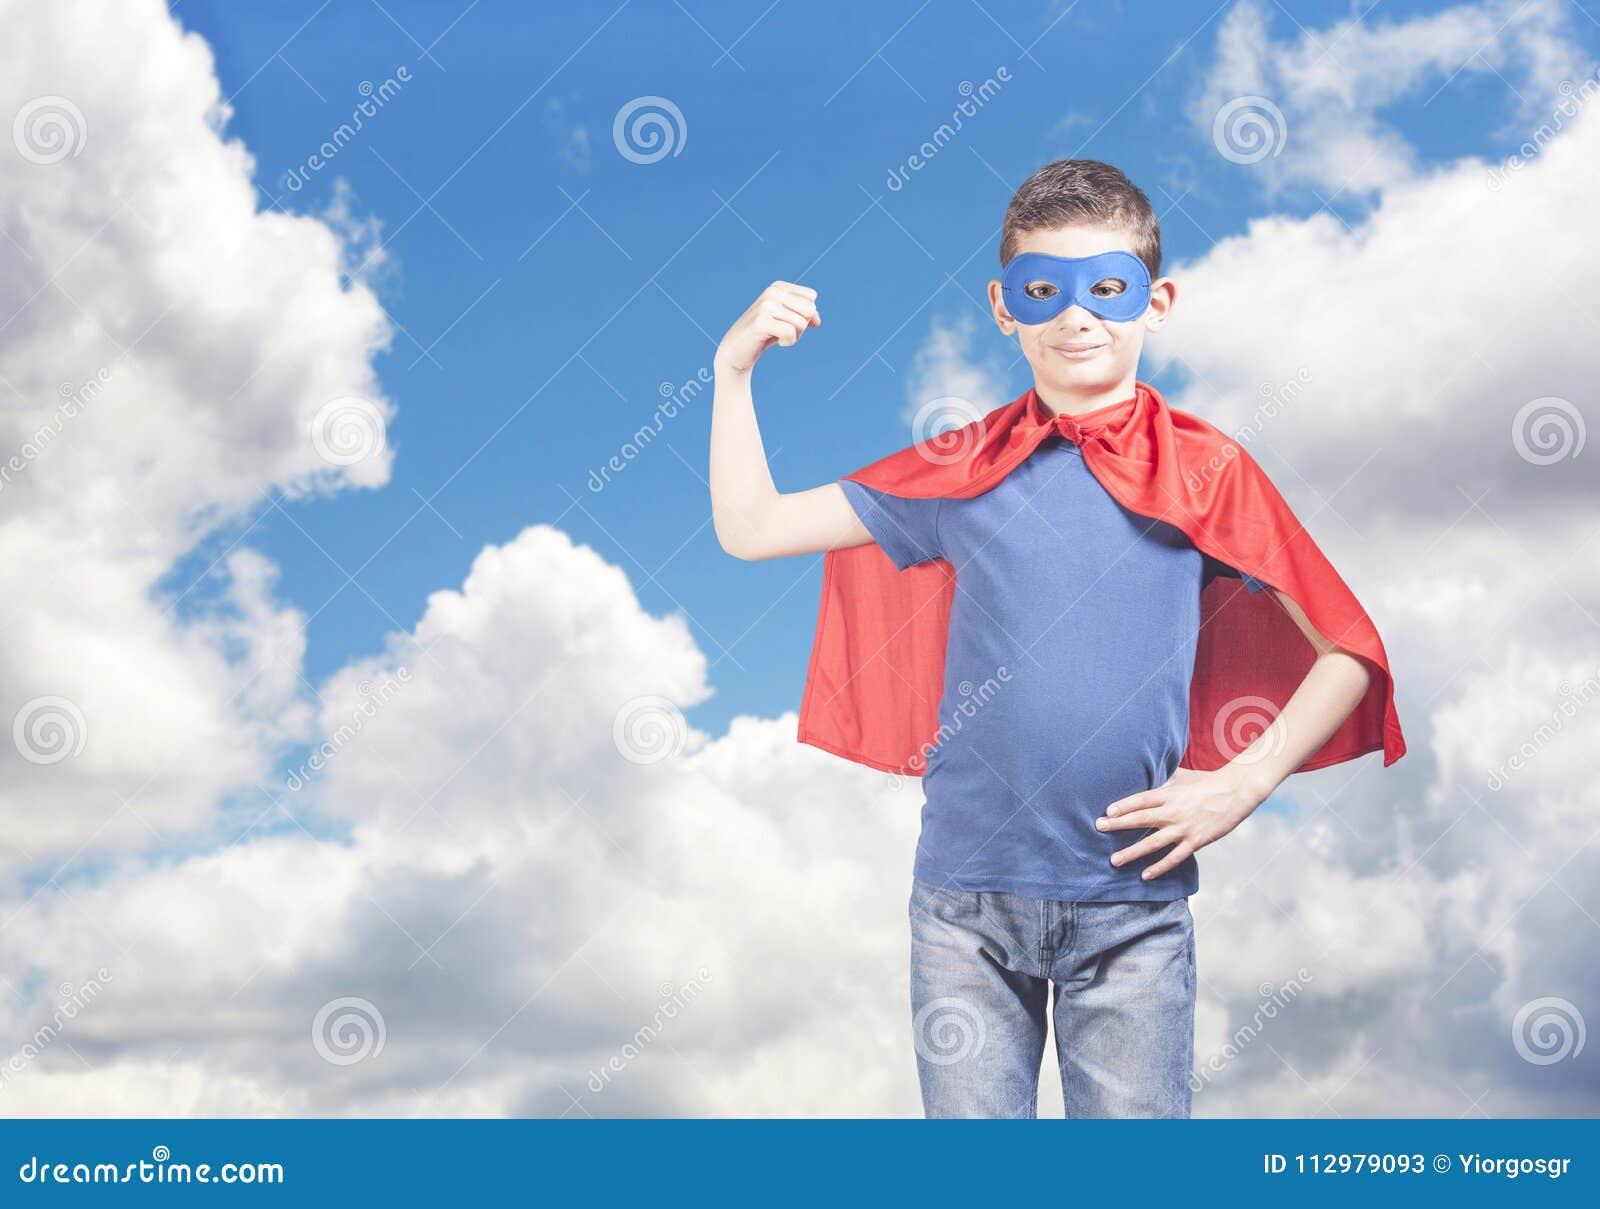 Superhero kid. Success and confidence concept